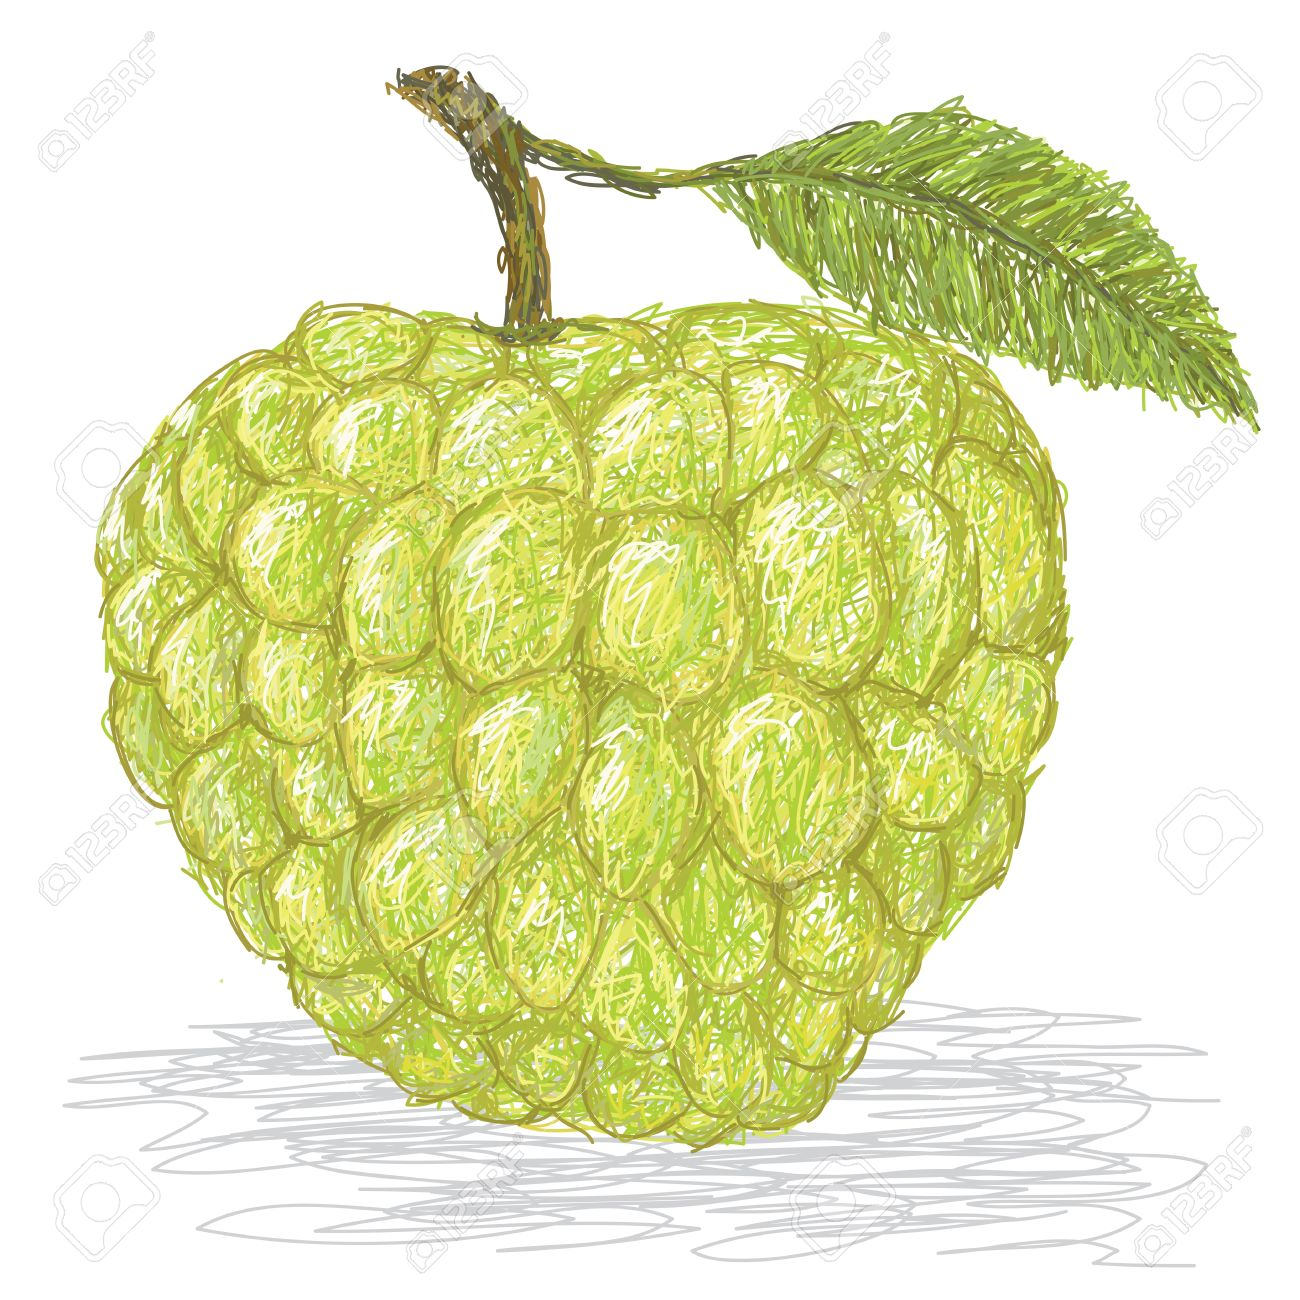 188 Custard Apple Stock Vector Illustration And Royalty Free.